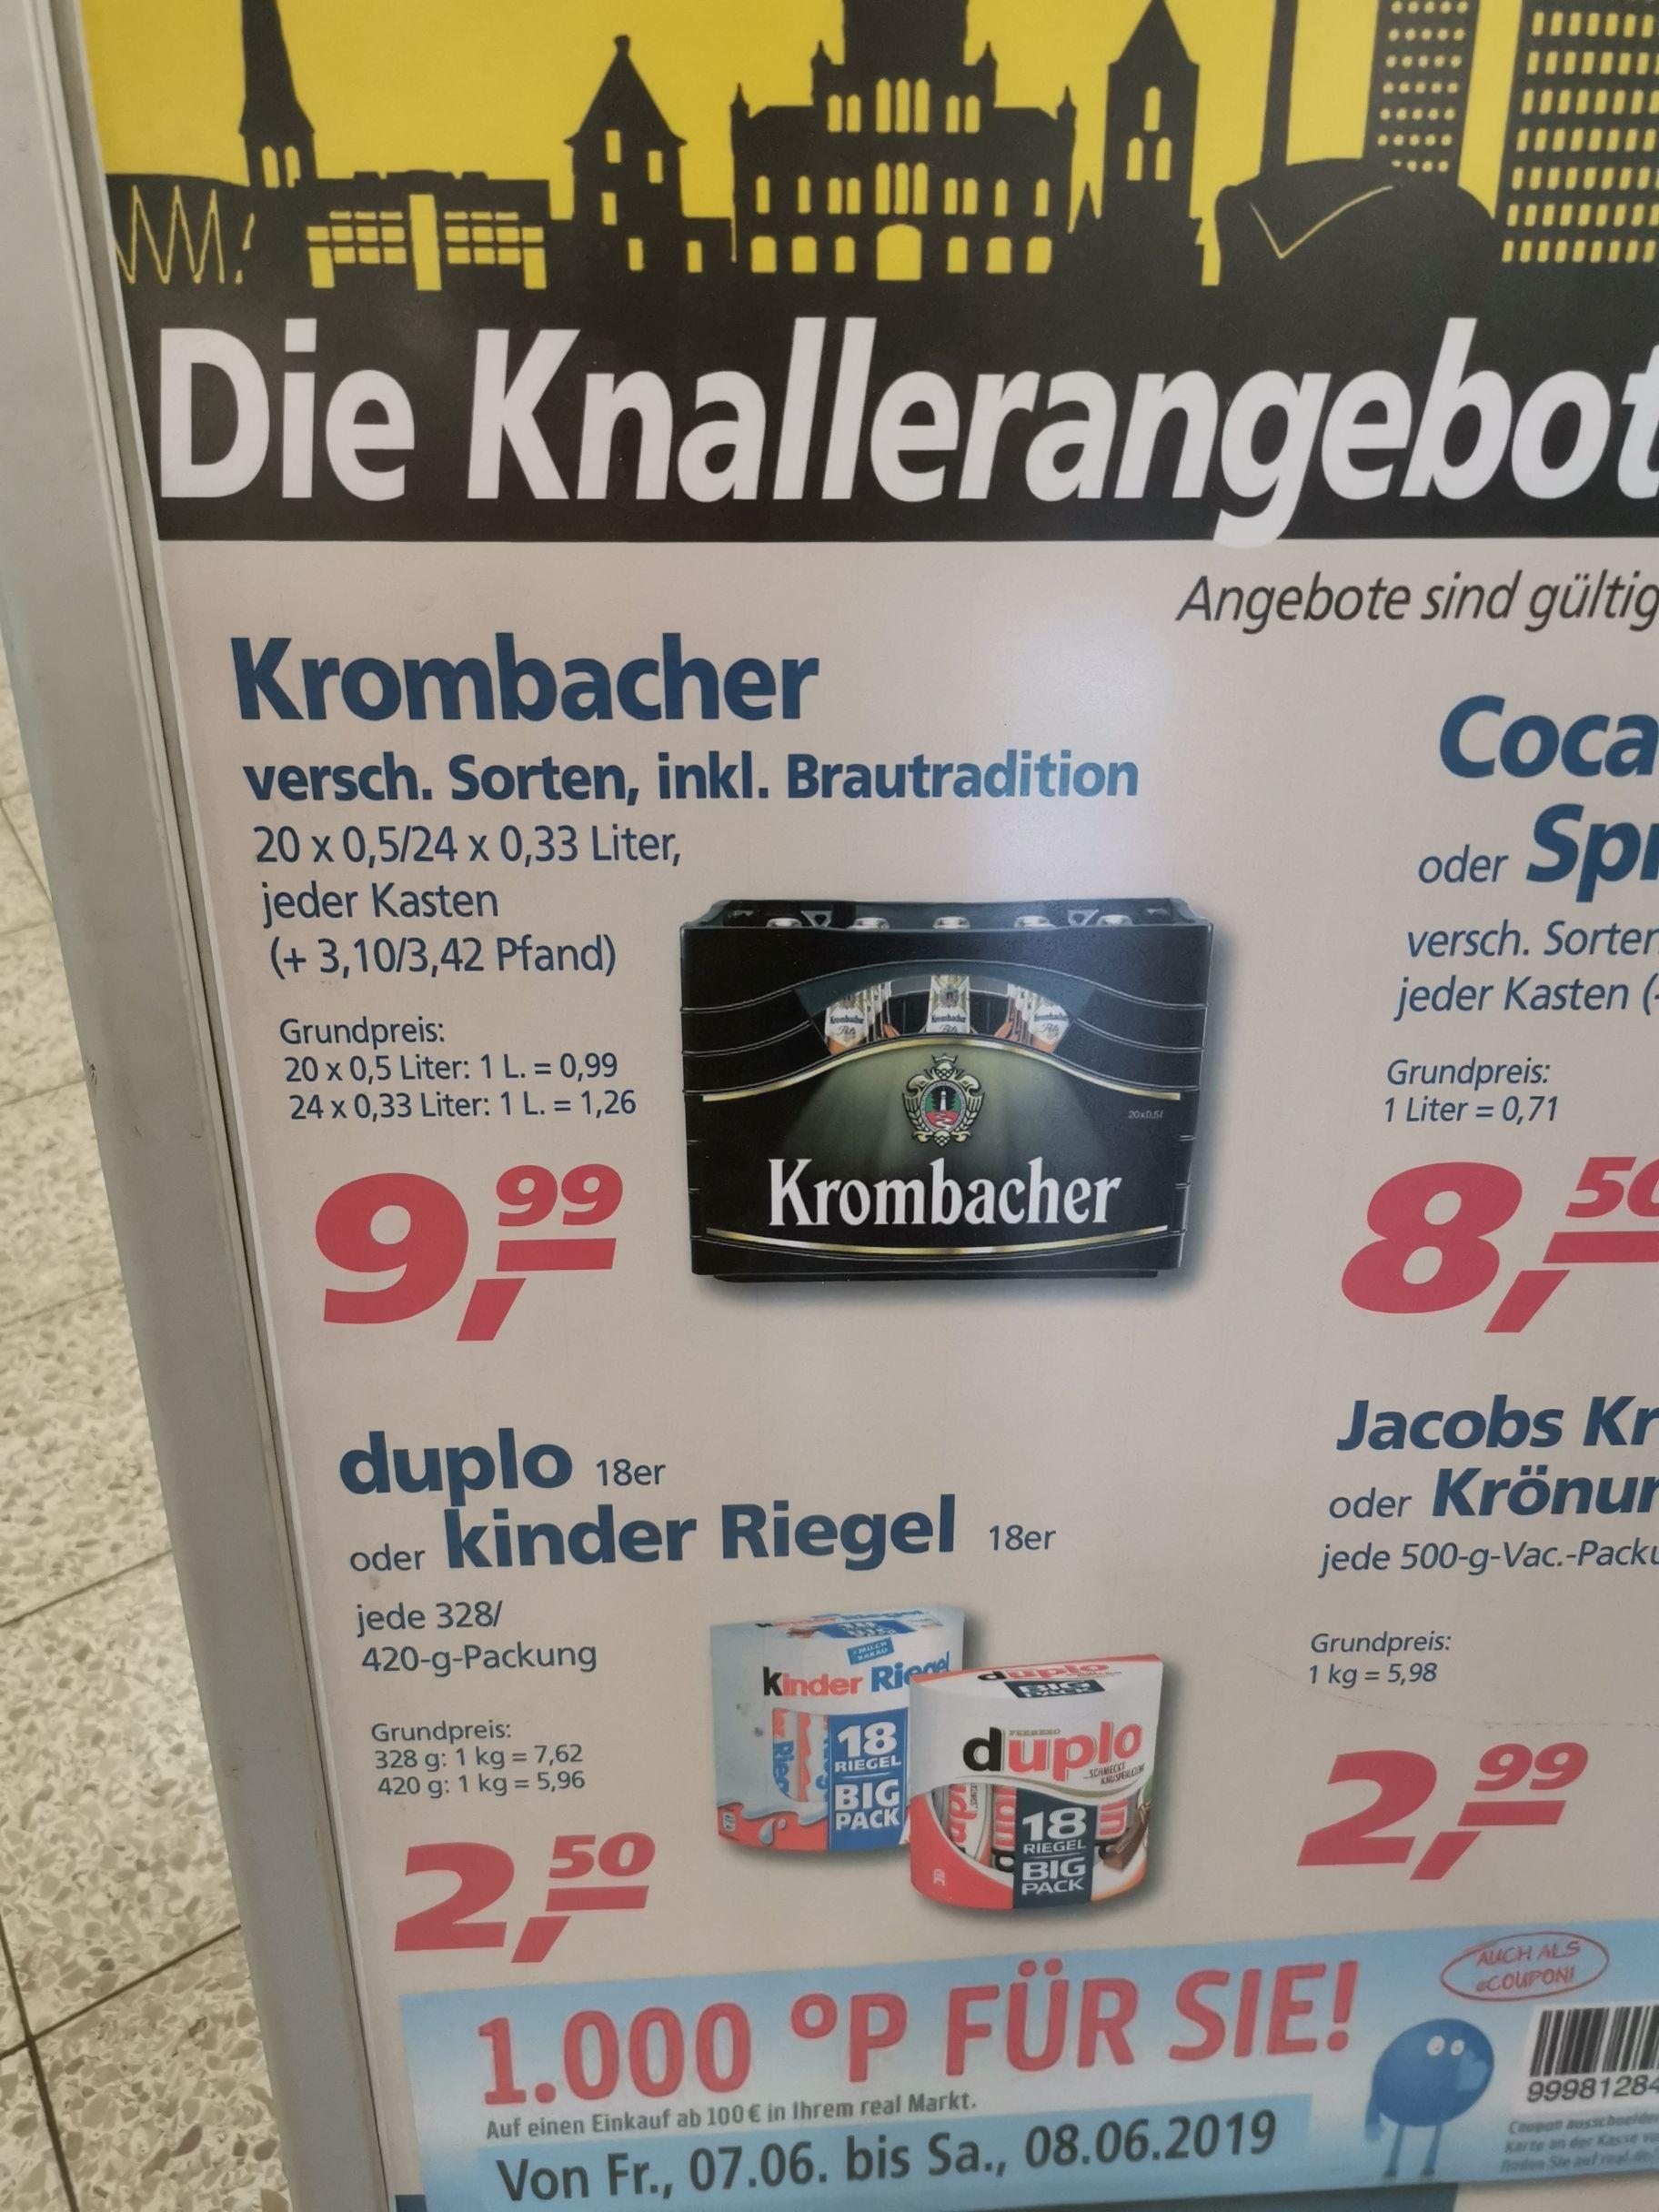 KROMBACHER - Real Dortmund-Eving [lokal]